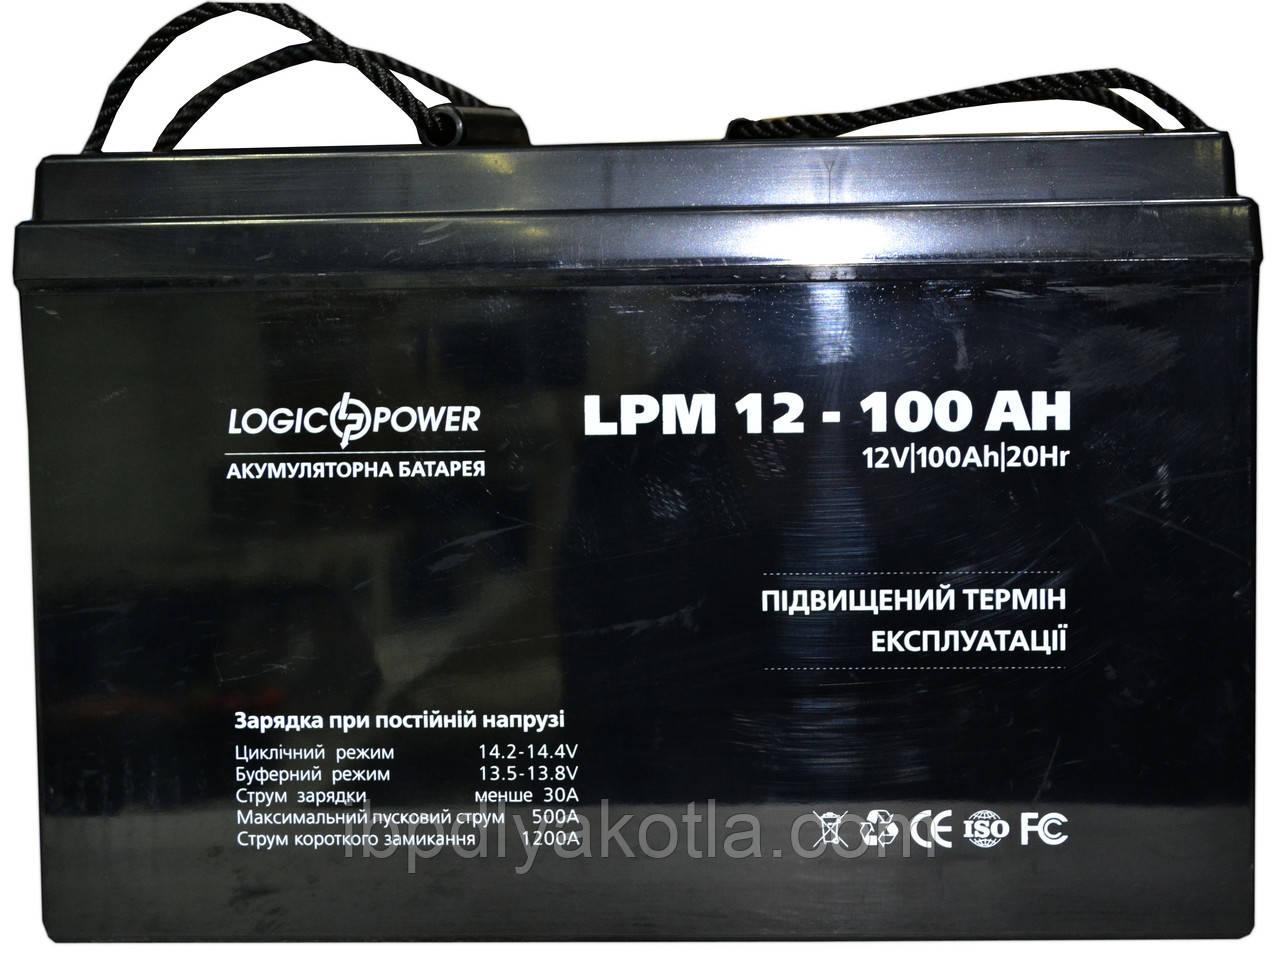 Аккумулятор Logicpower LPM 12V 100AH, (AGM) для ИБП